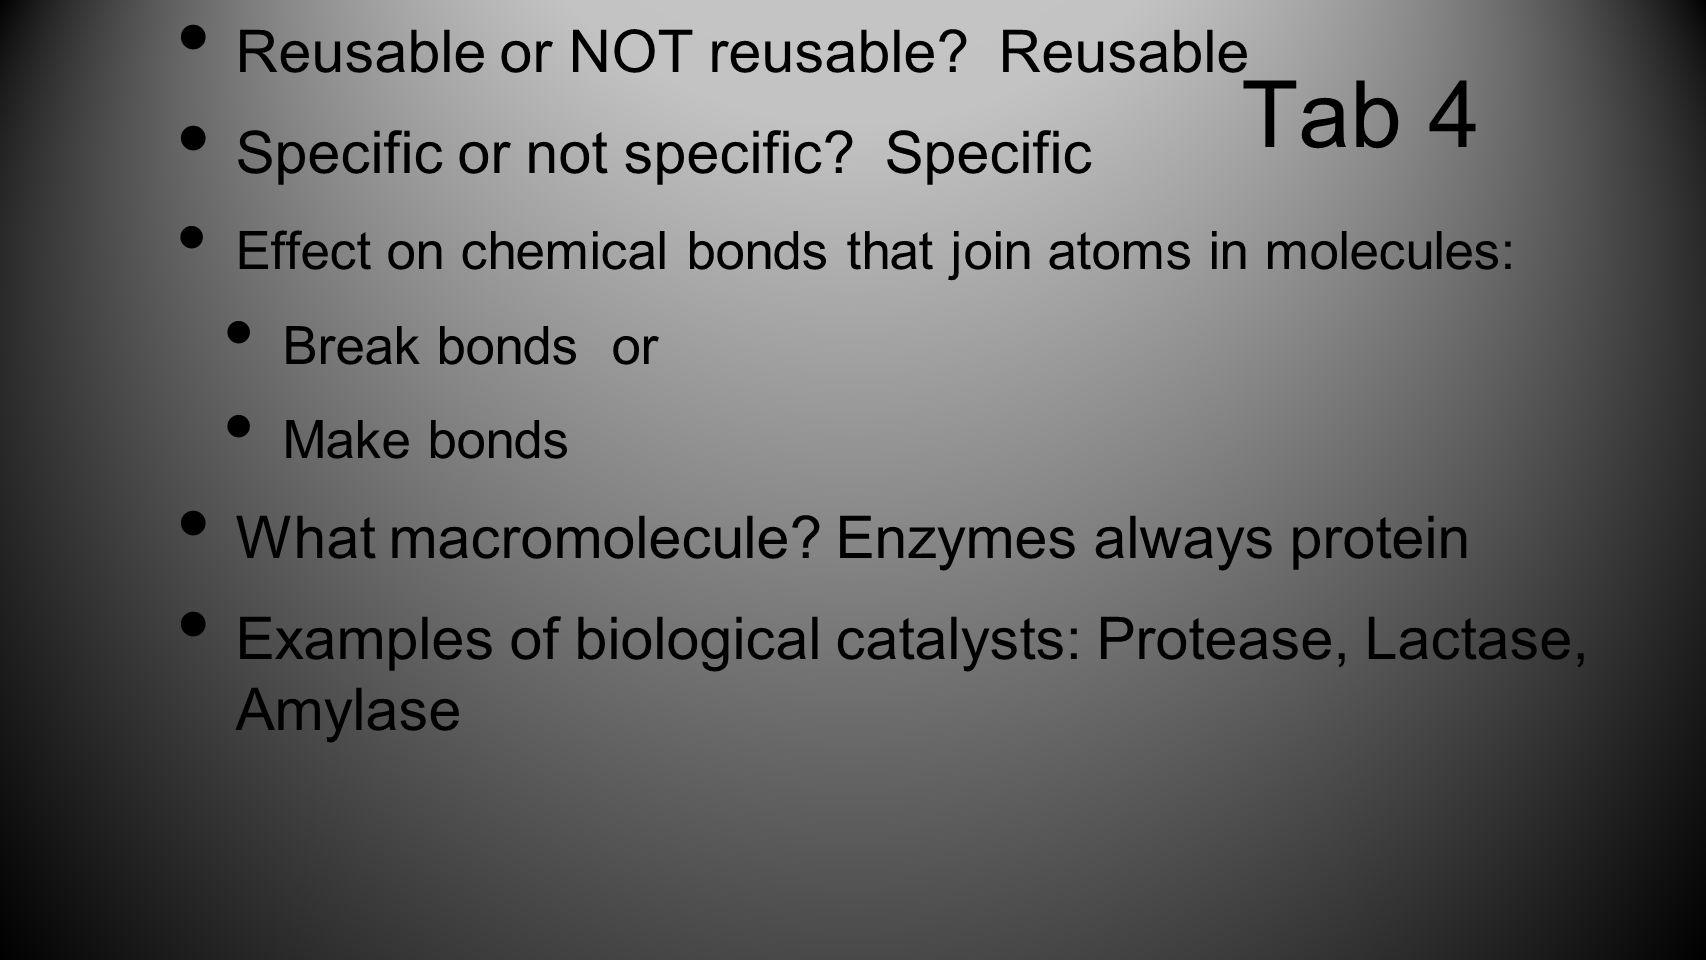 Tab 4 Reusable or NOT reusable Reusable